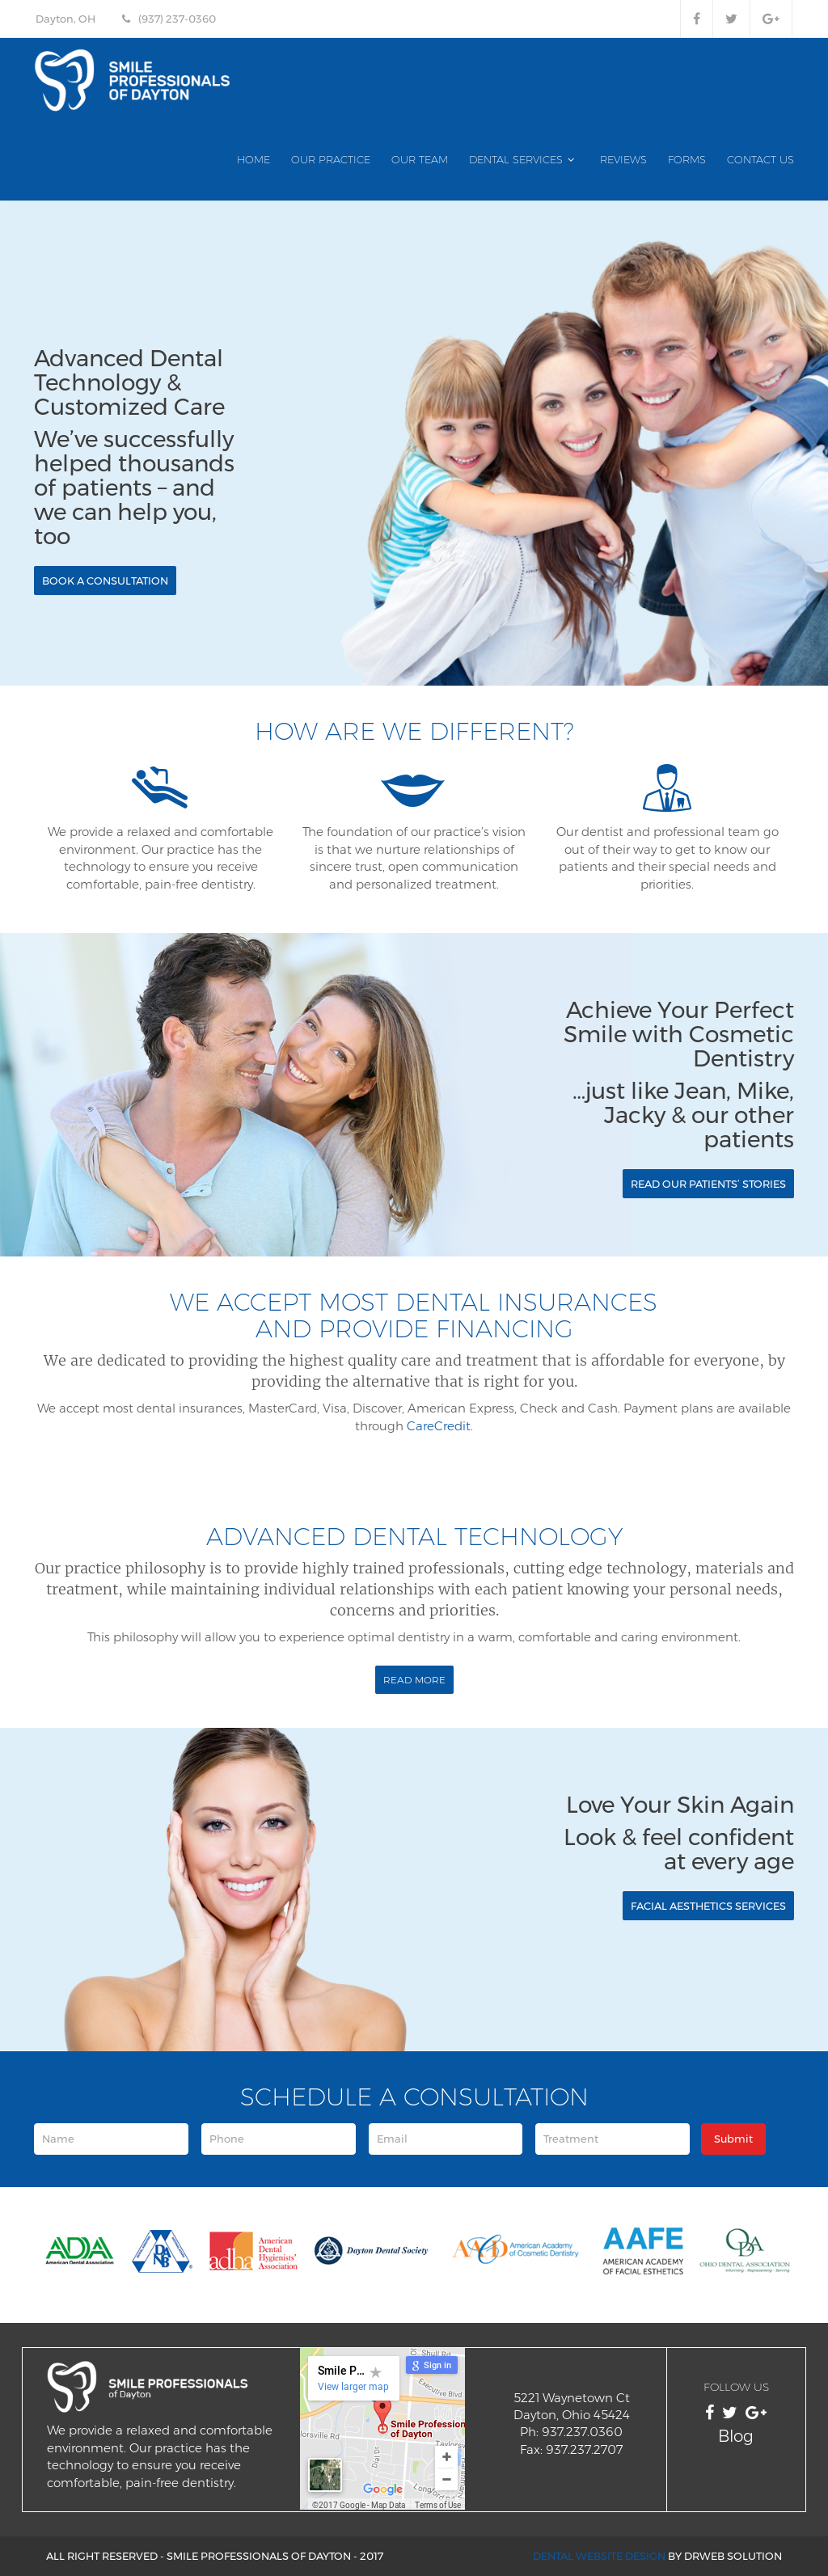 Dayton dating website